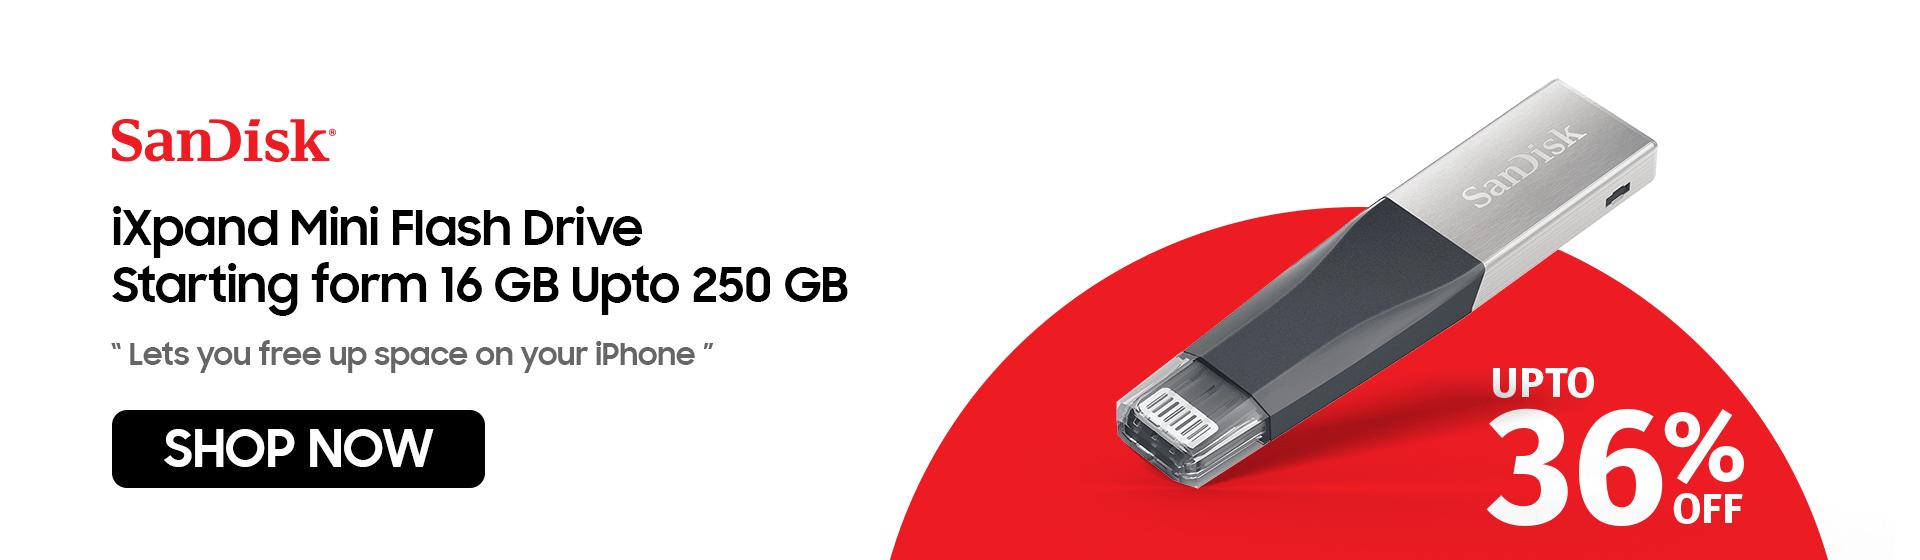 SanDisk iXpand Mini